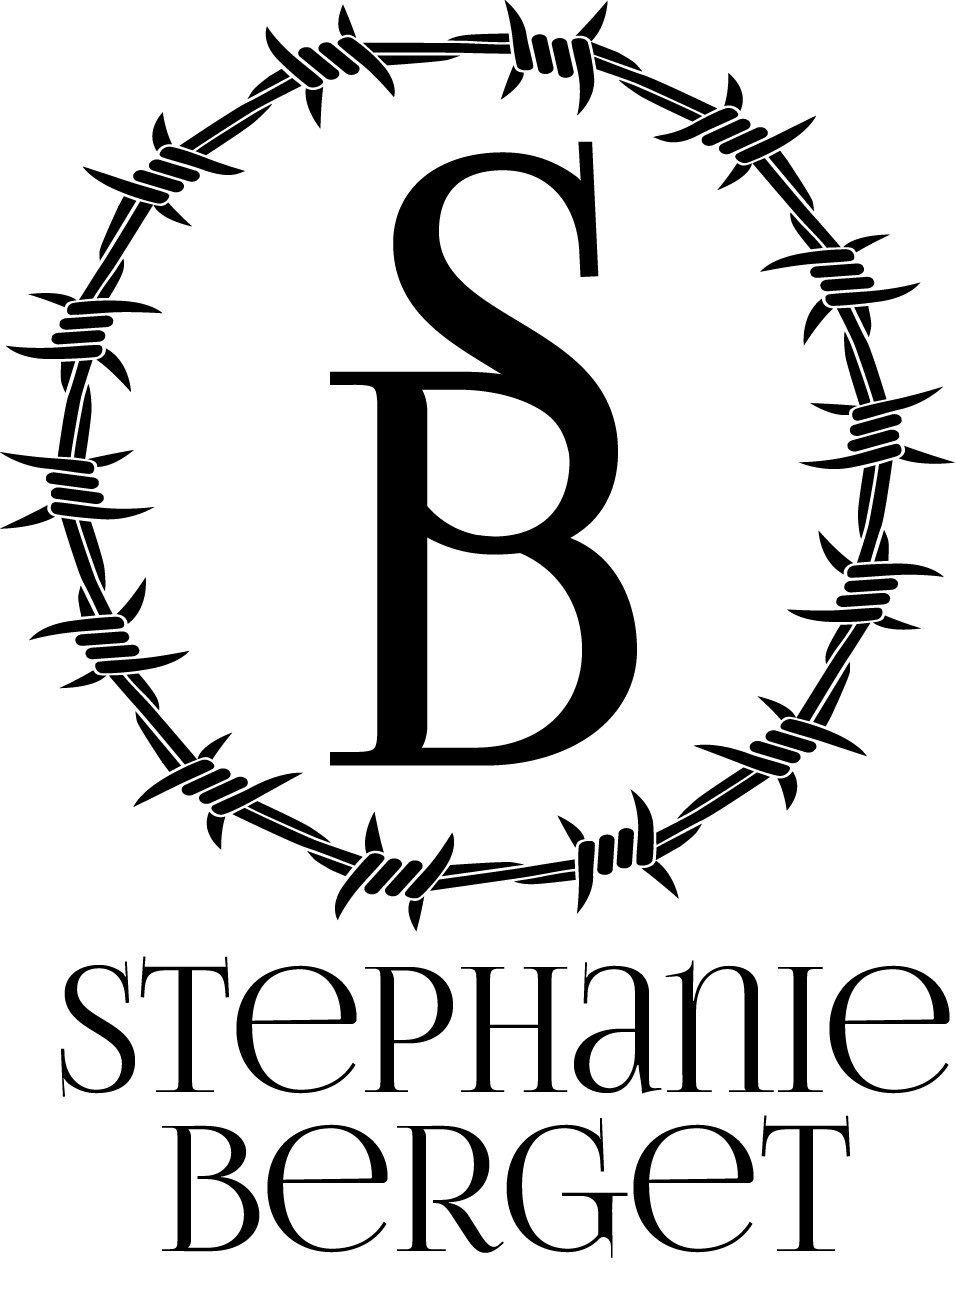 Stephanie Berget